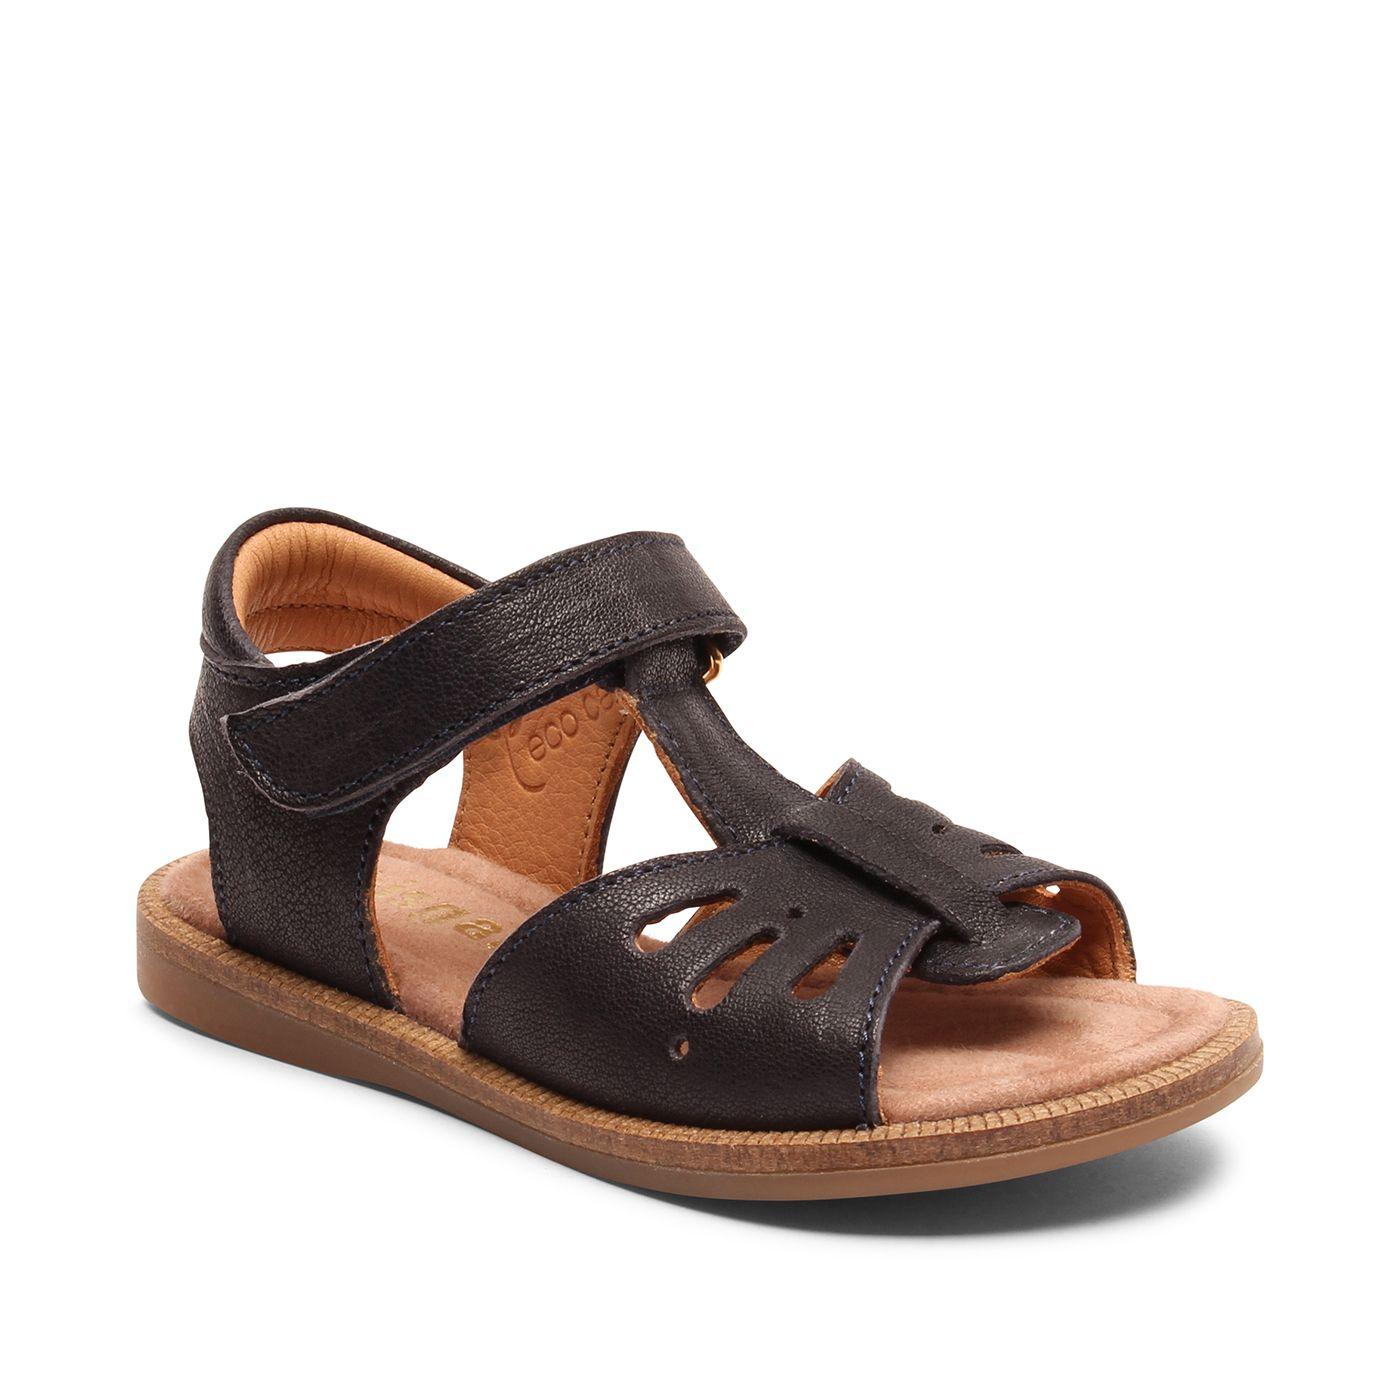 Bisgaard dívčí kožené sandály 70291 - 1423